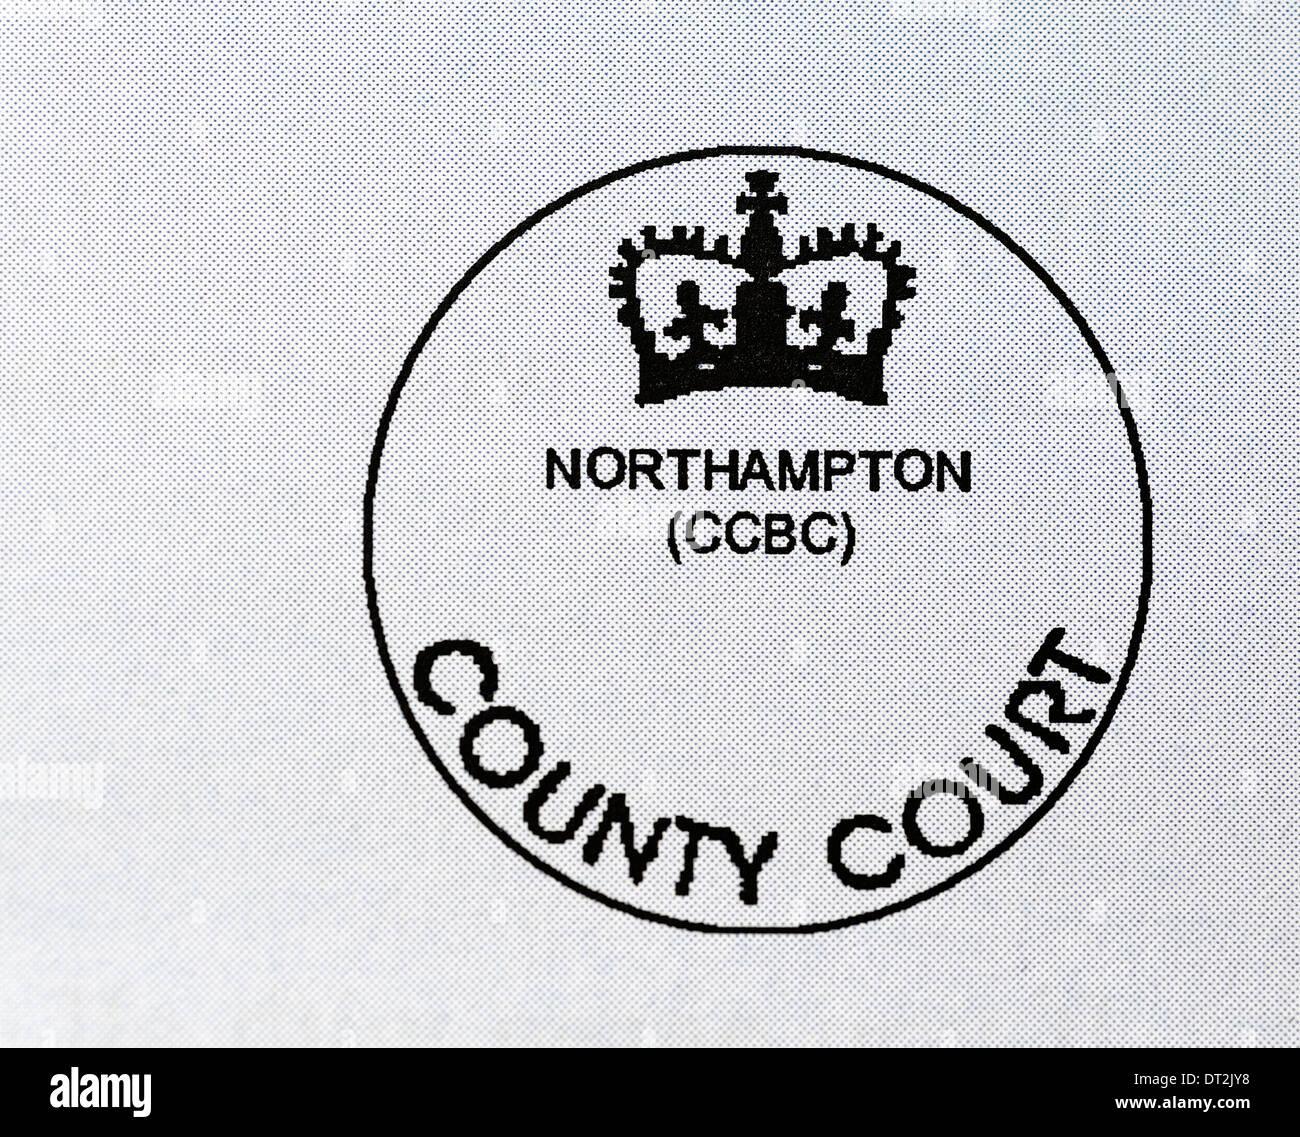 northampton county court bulk center stamp stock photo 66441628 alamy